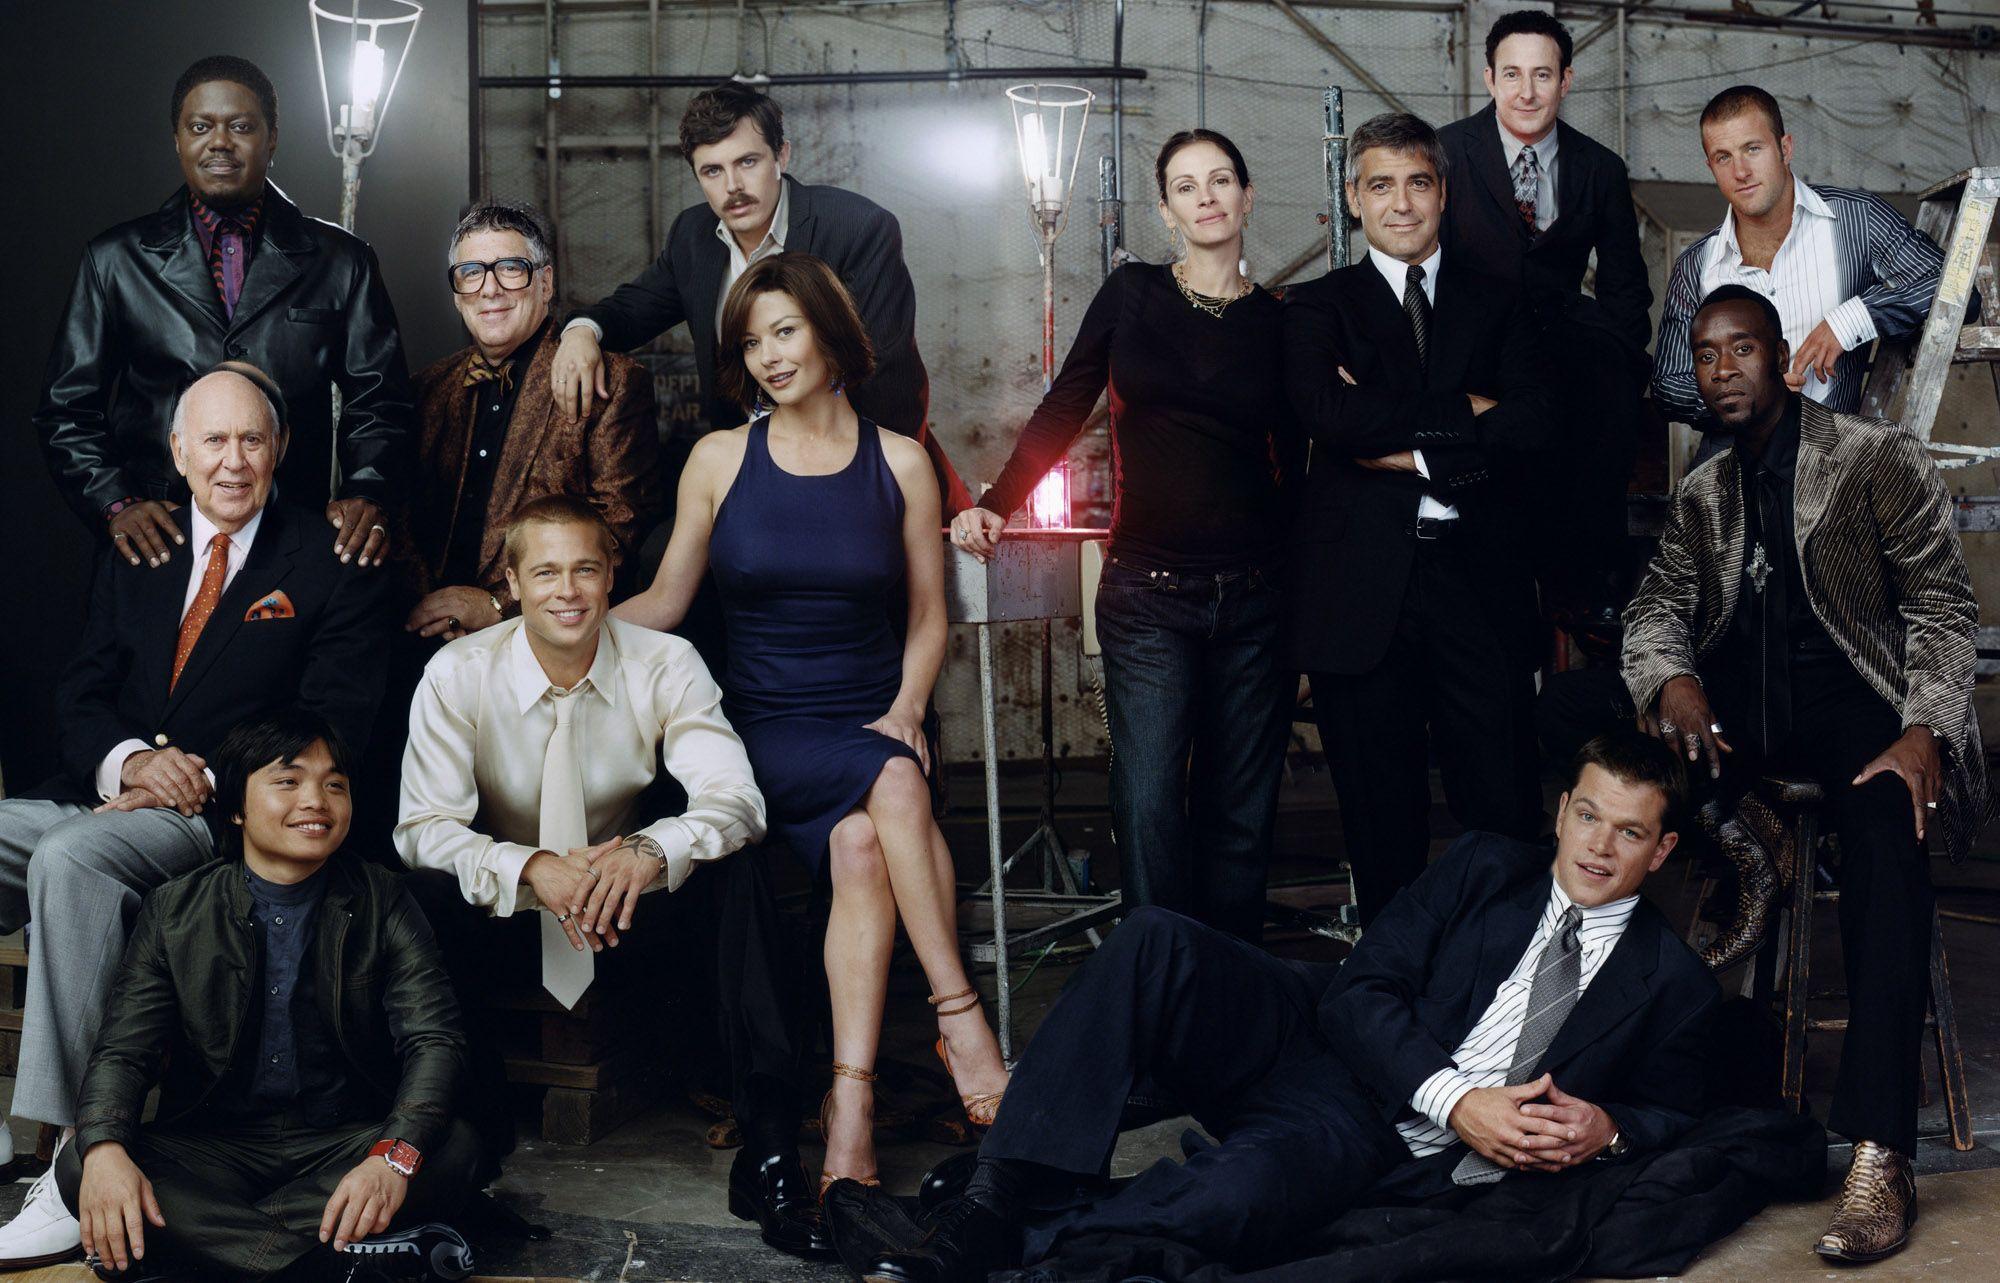 twelve cast